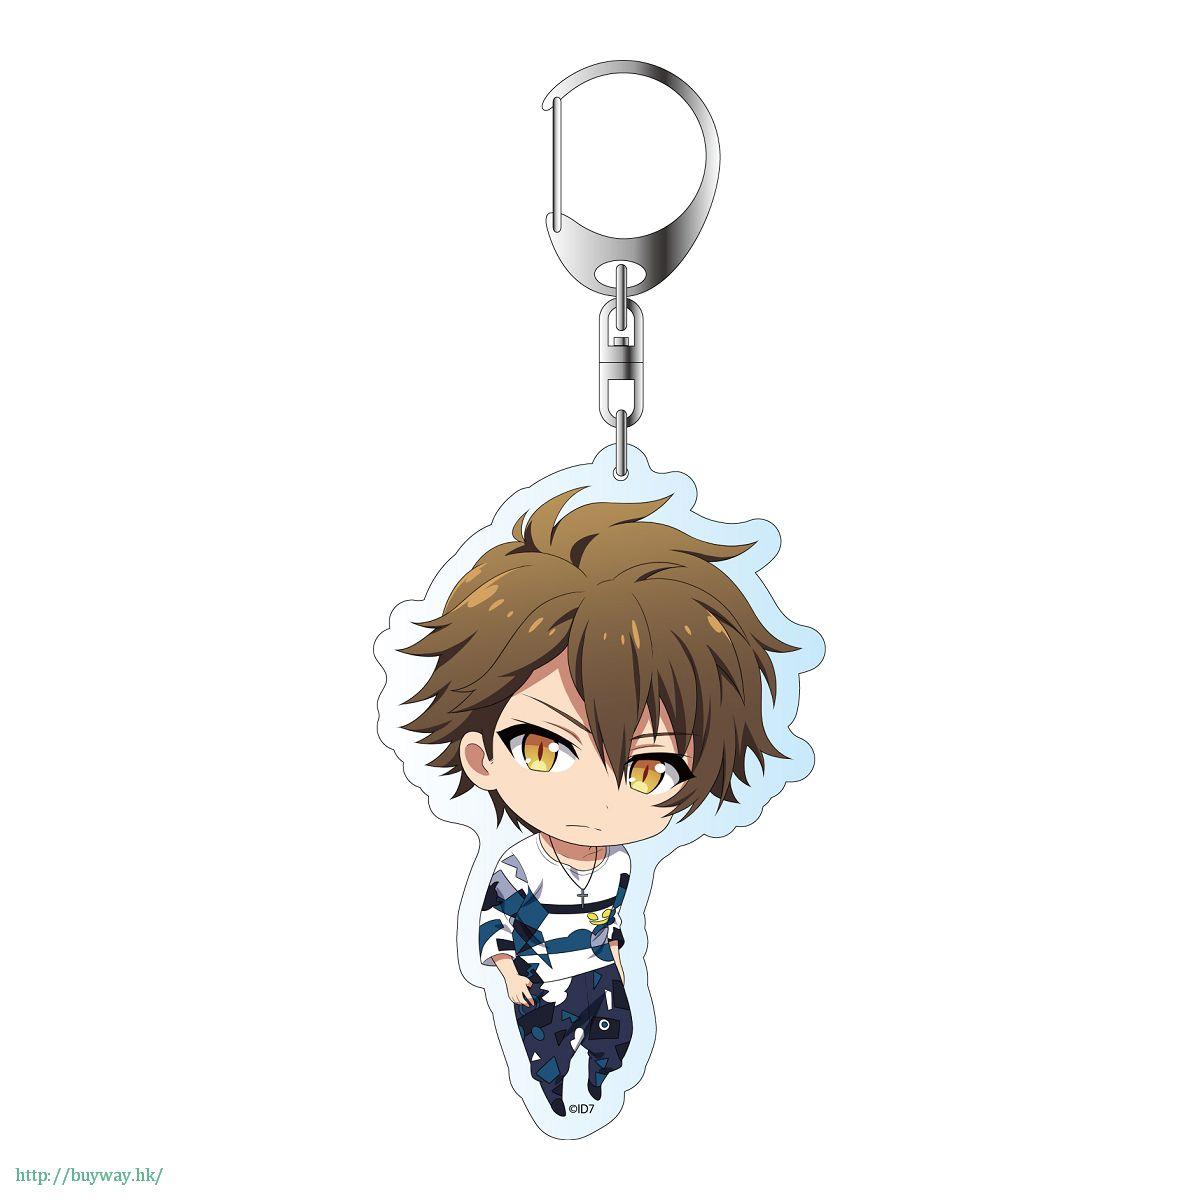 IDOLiSH7 「十龍之介」Monster Parade 亞克力匙扣 Monster Parade Acrylic Key Chain Tsunashi Ryunosuke【IDOLiSH7】